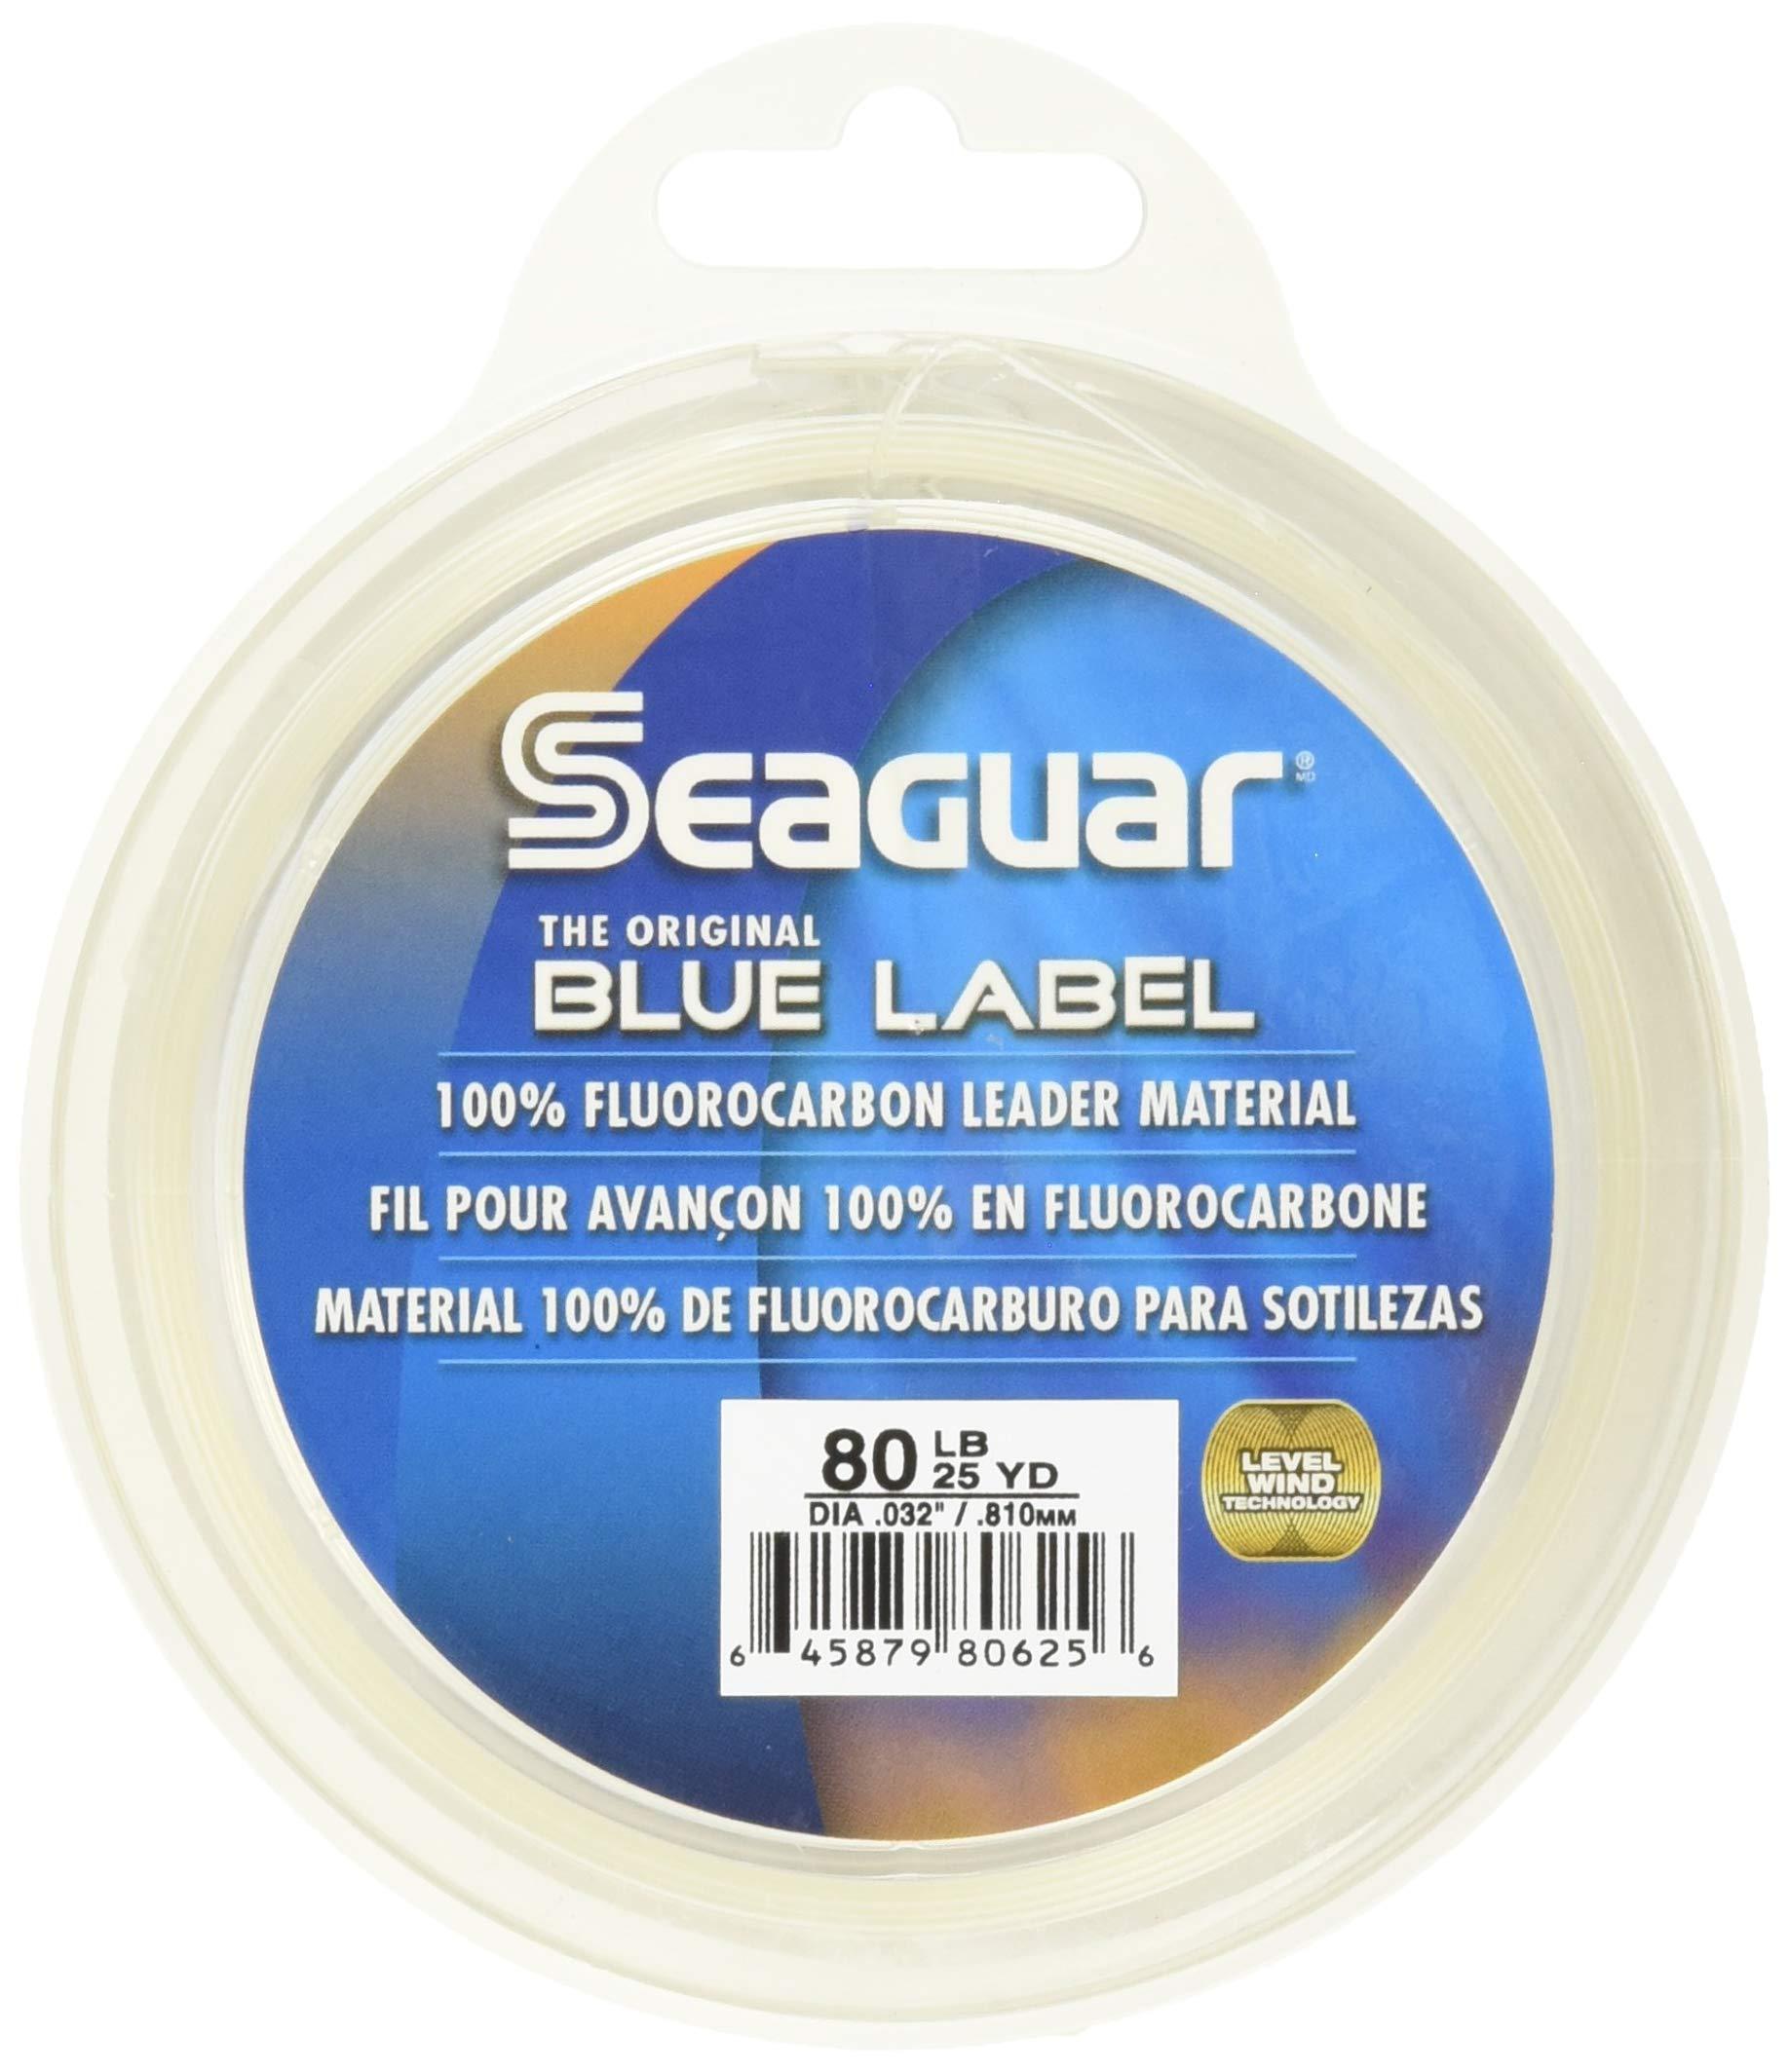 Seaguar Blue Label 25-Yards Fluorocarbon Leader (2-Pounds)